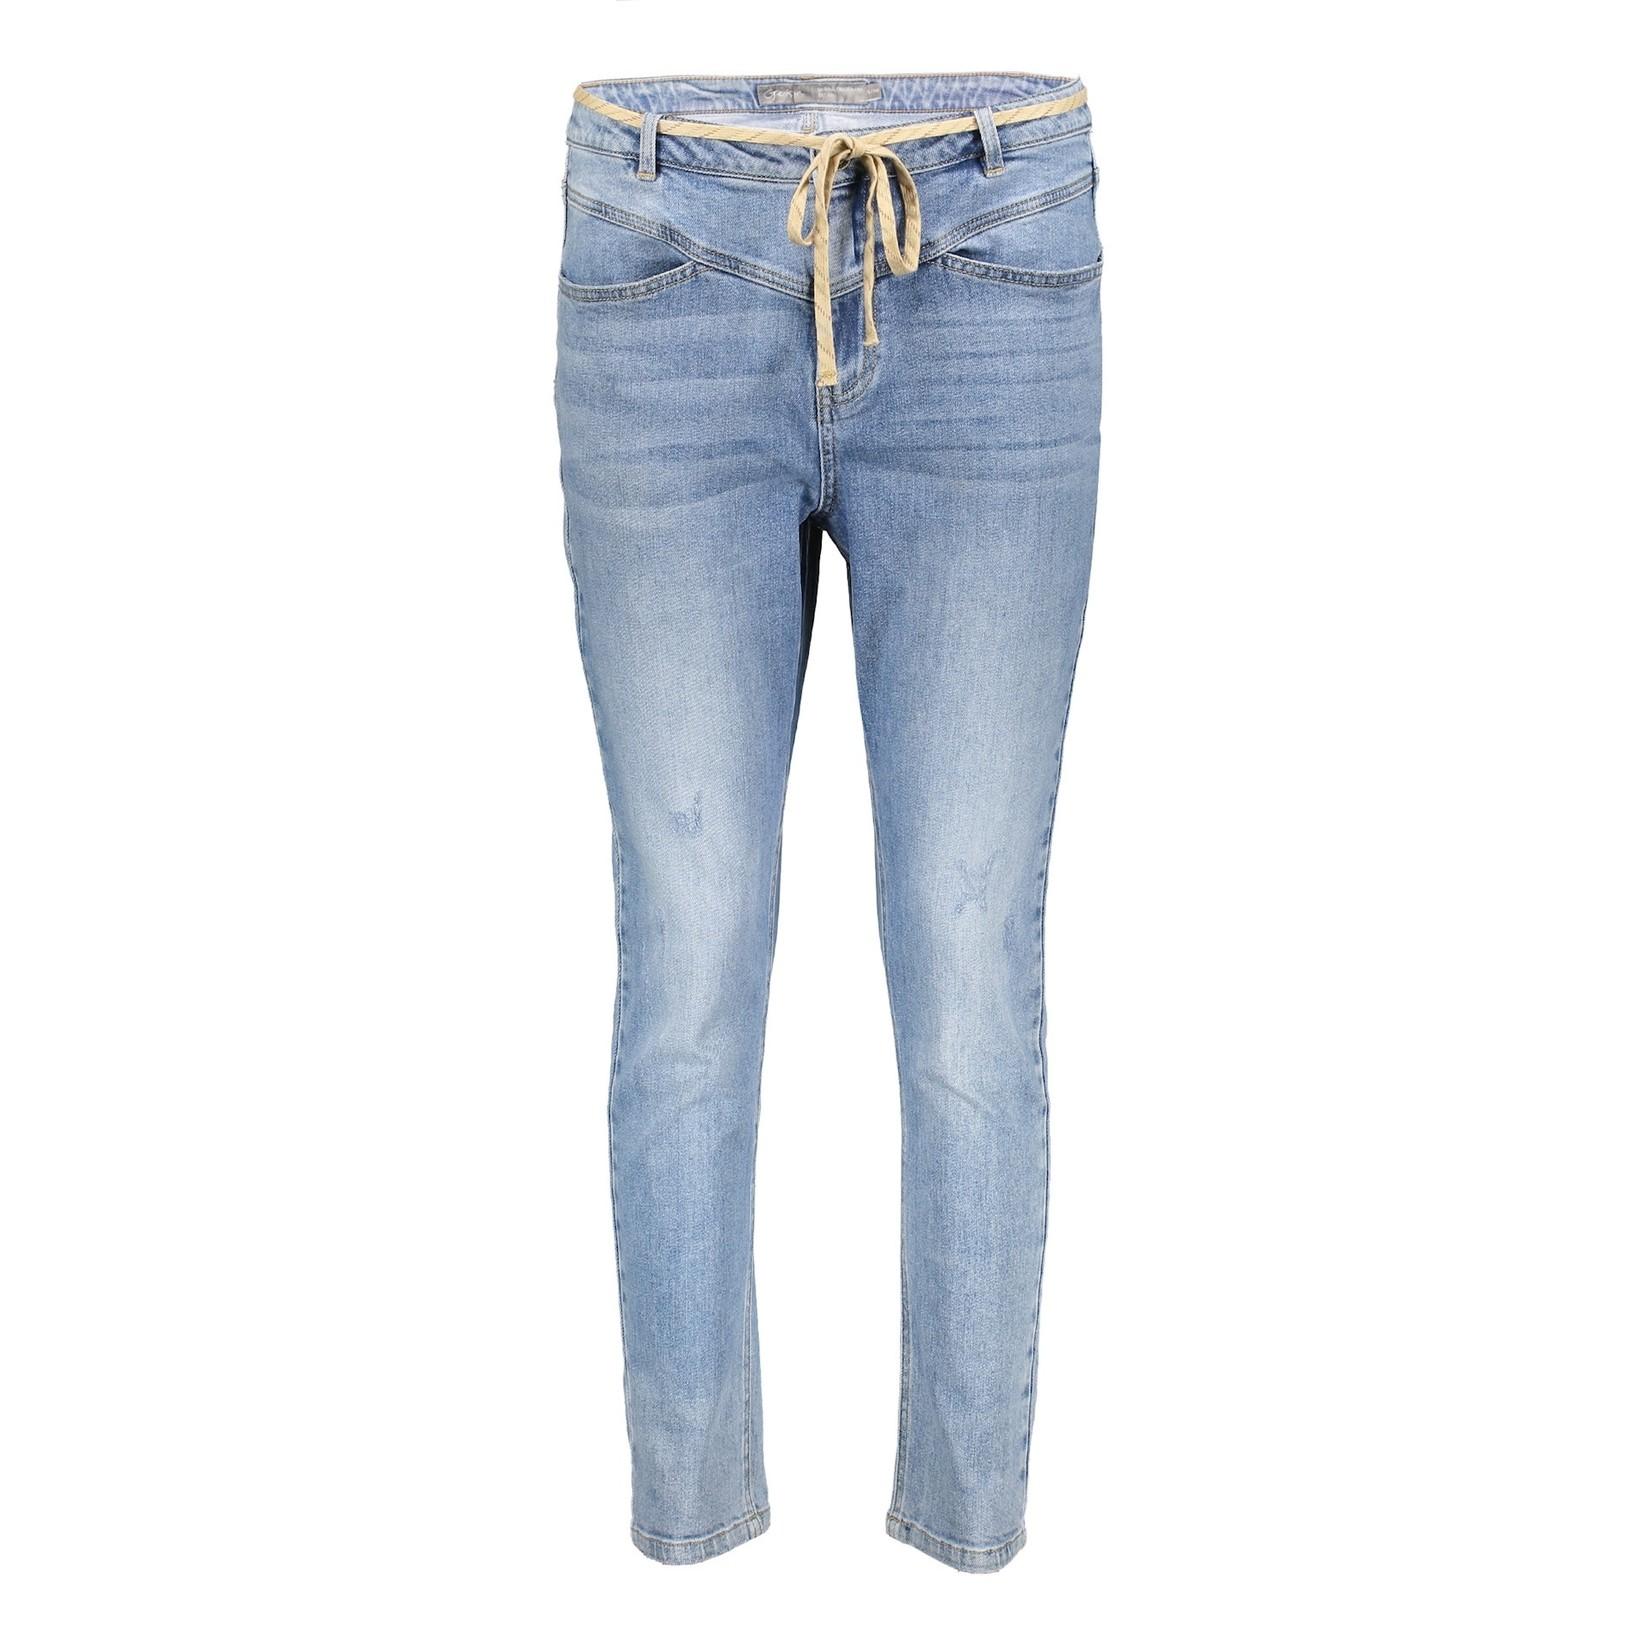 Geisha Geisha jeans with lace at waist 11017-10